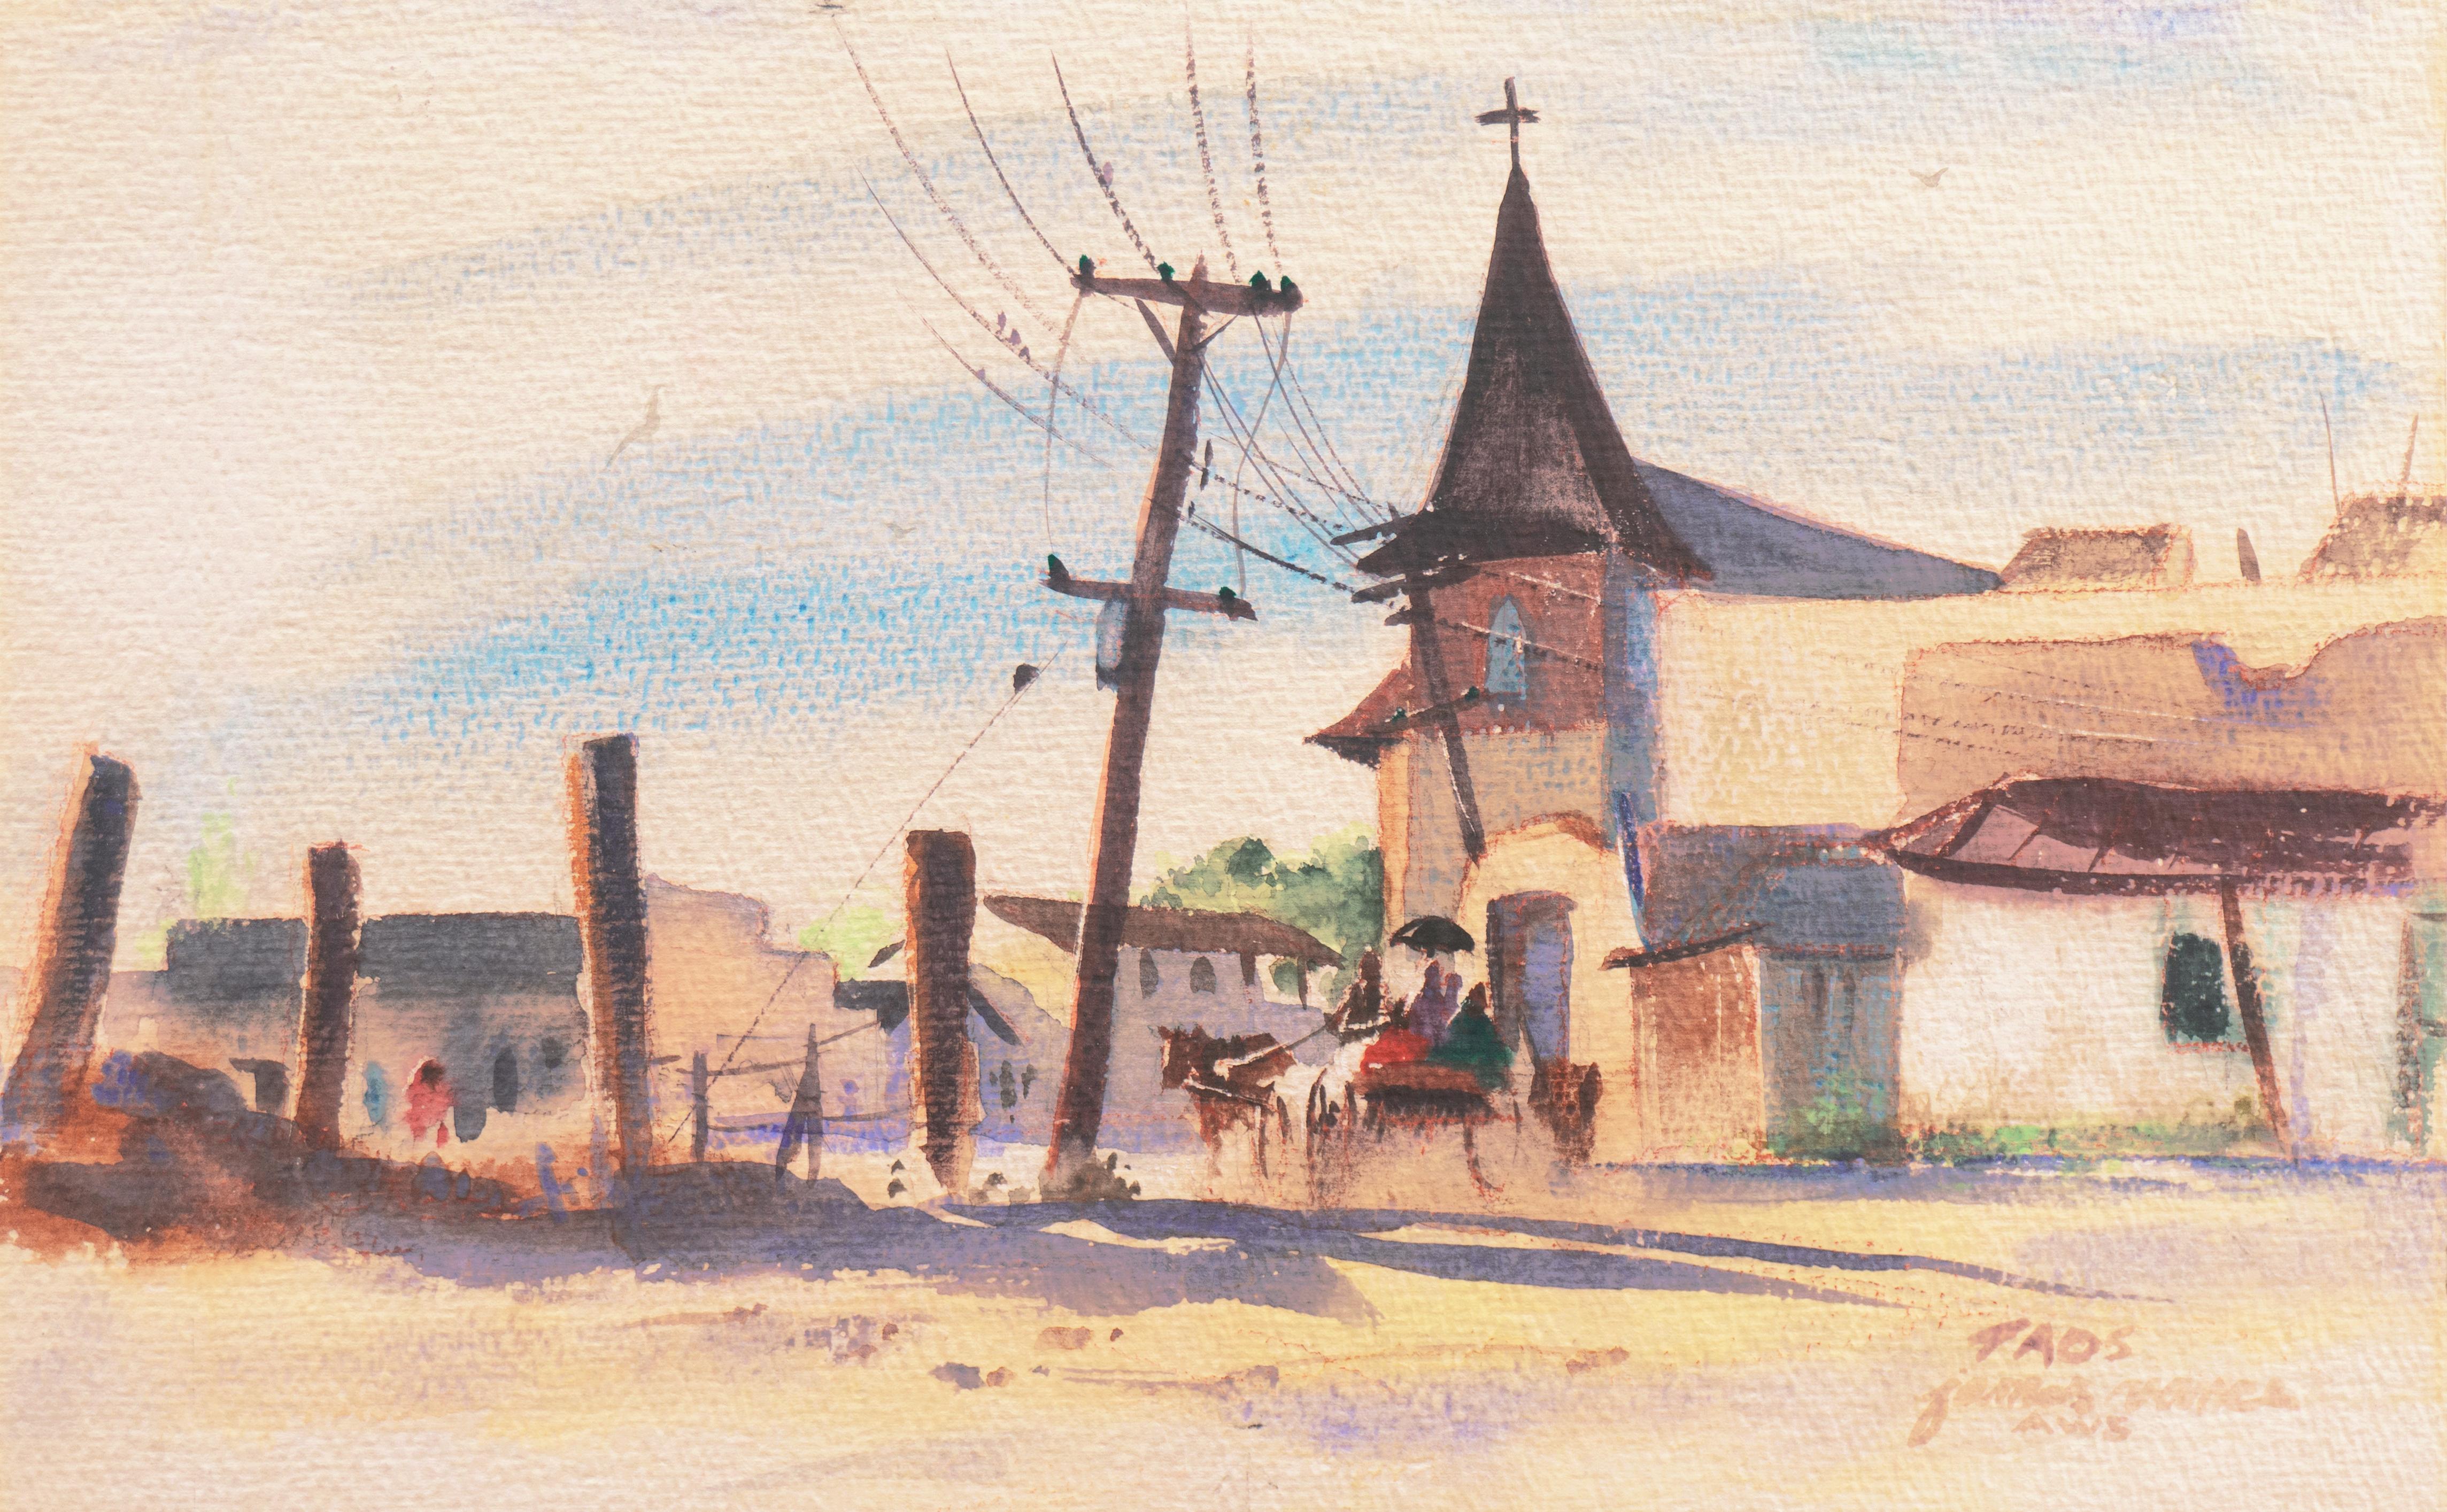 'Taos', American Watercolor Society, Chouinard, New York, Art Student's League